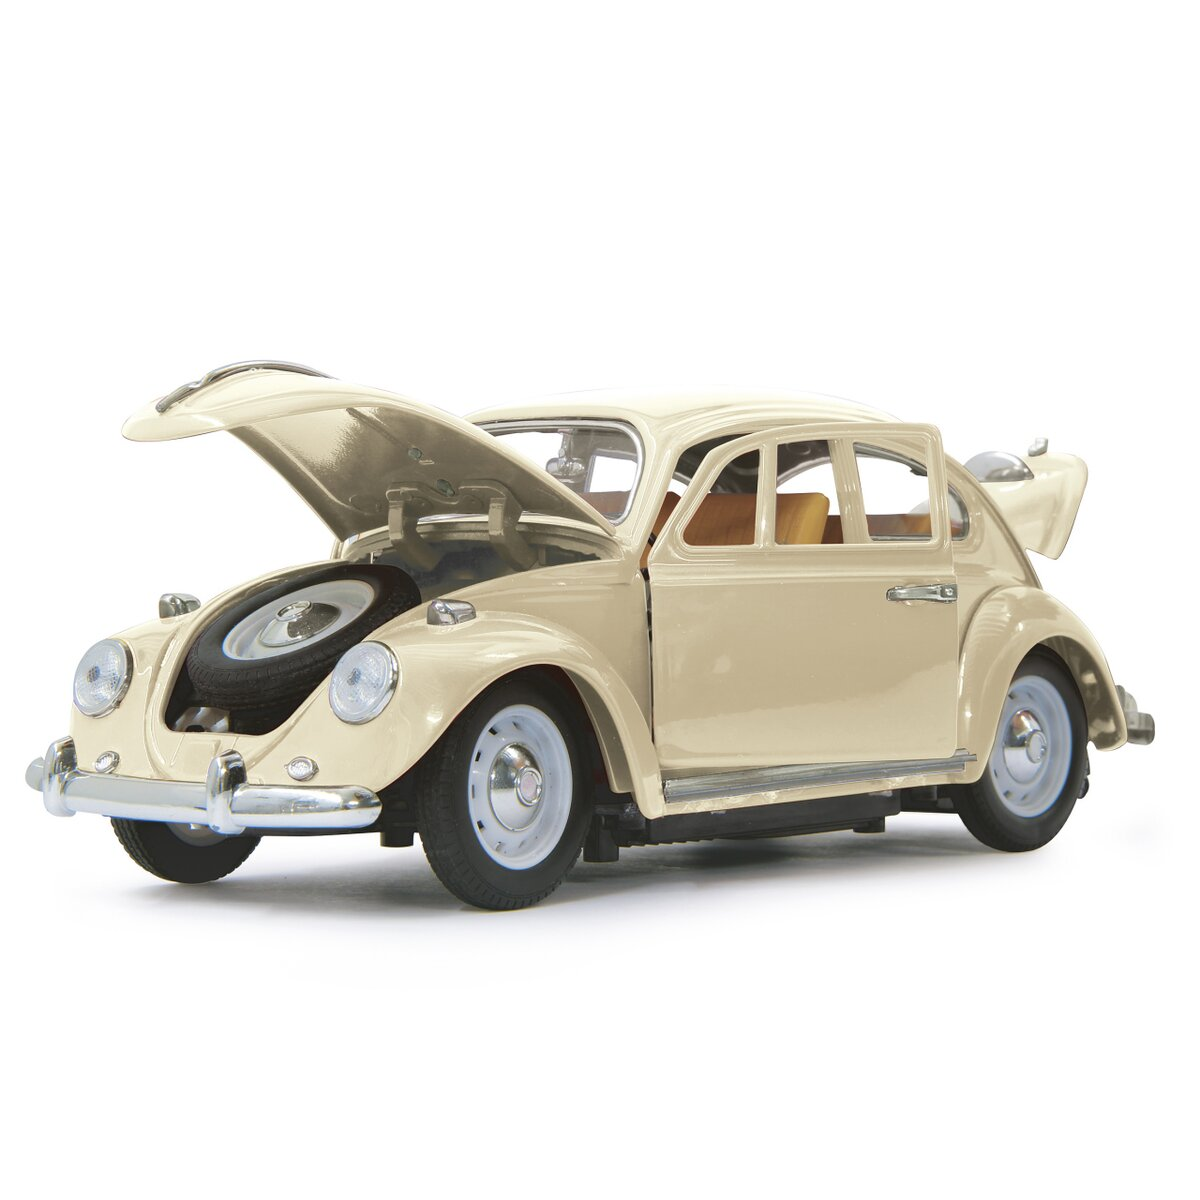 Jamara VW Beatle 1:18 RC Die Cast krémově bílý 40MHz